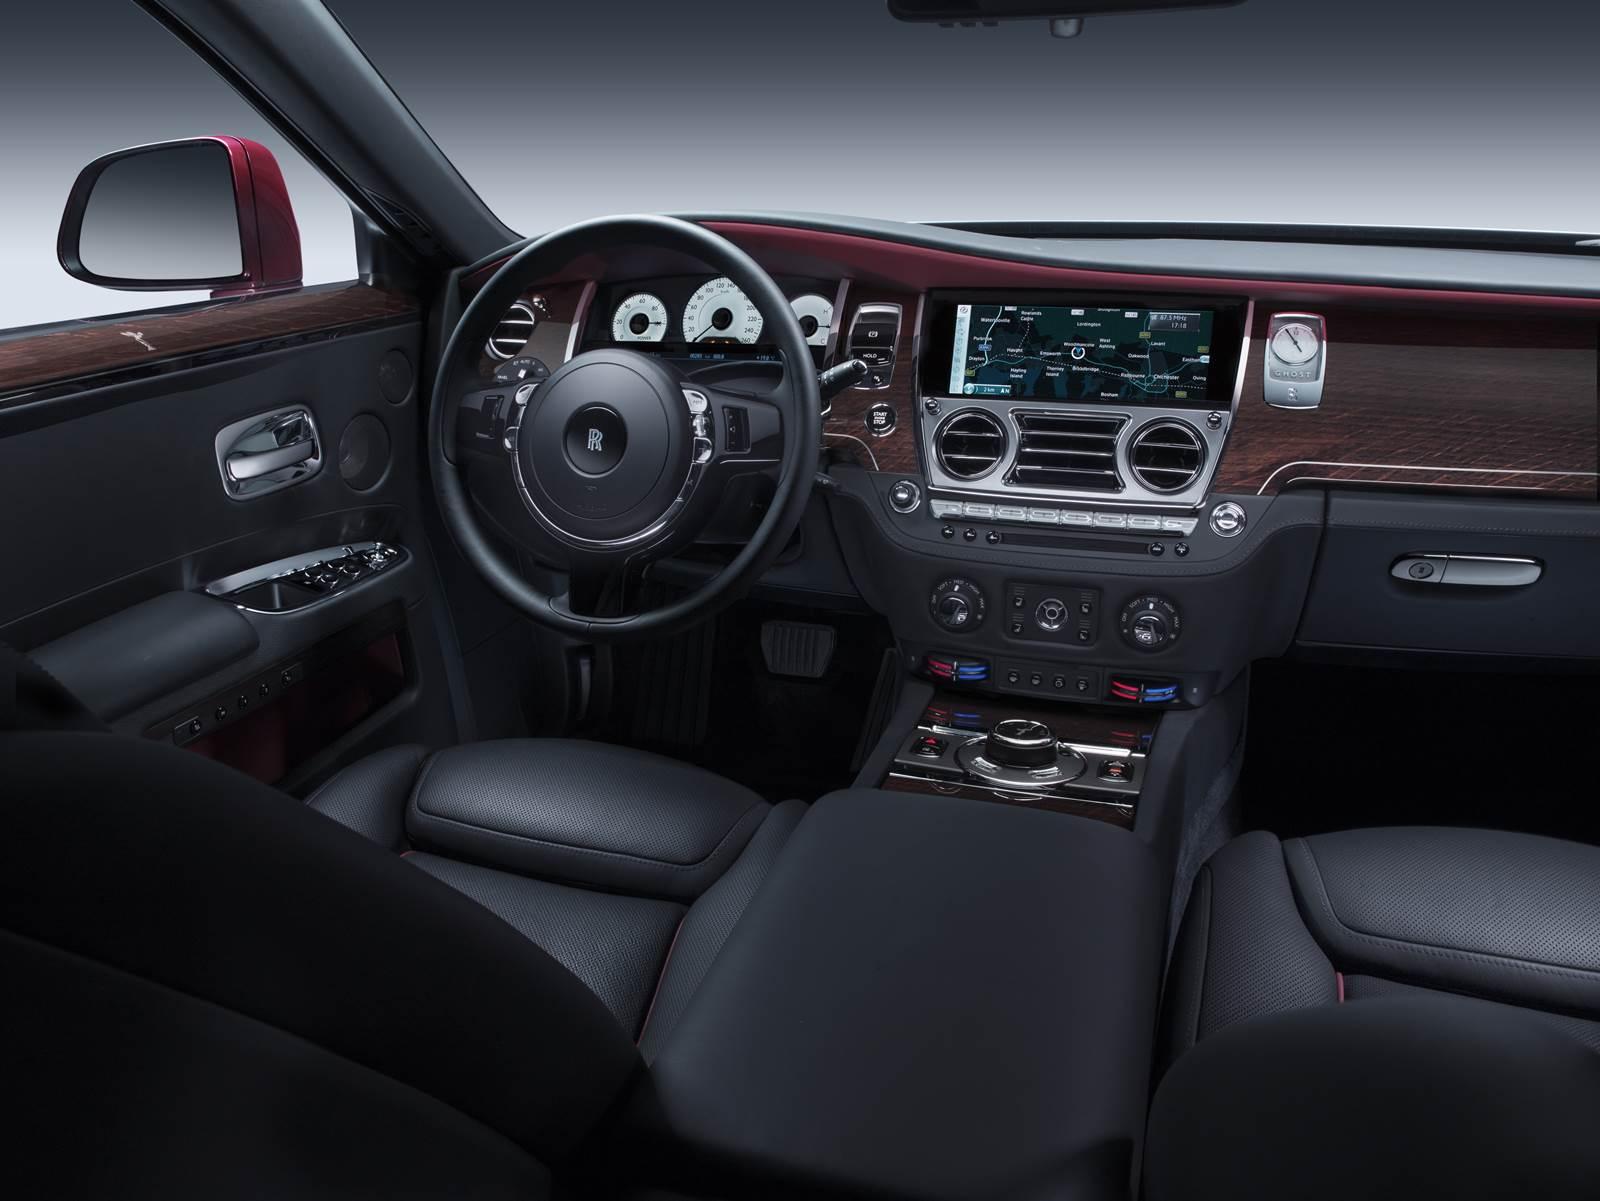 Rolls Royce Ghost Série II - interior